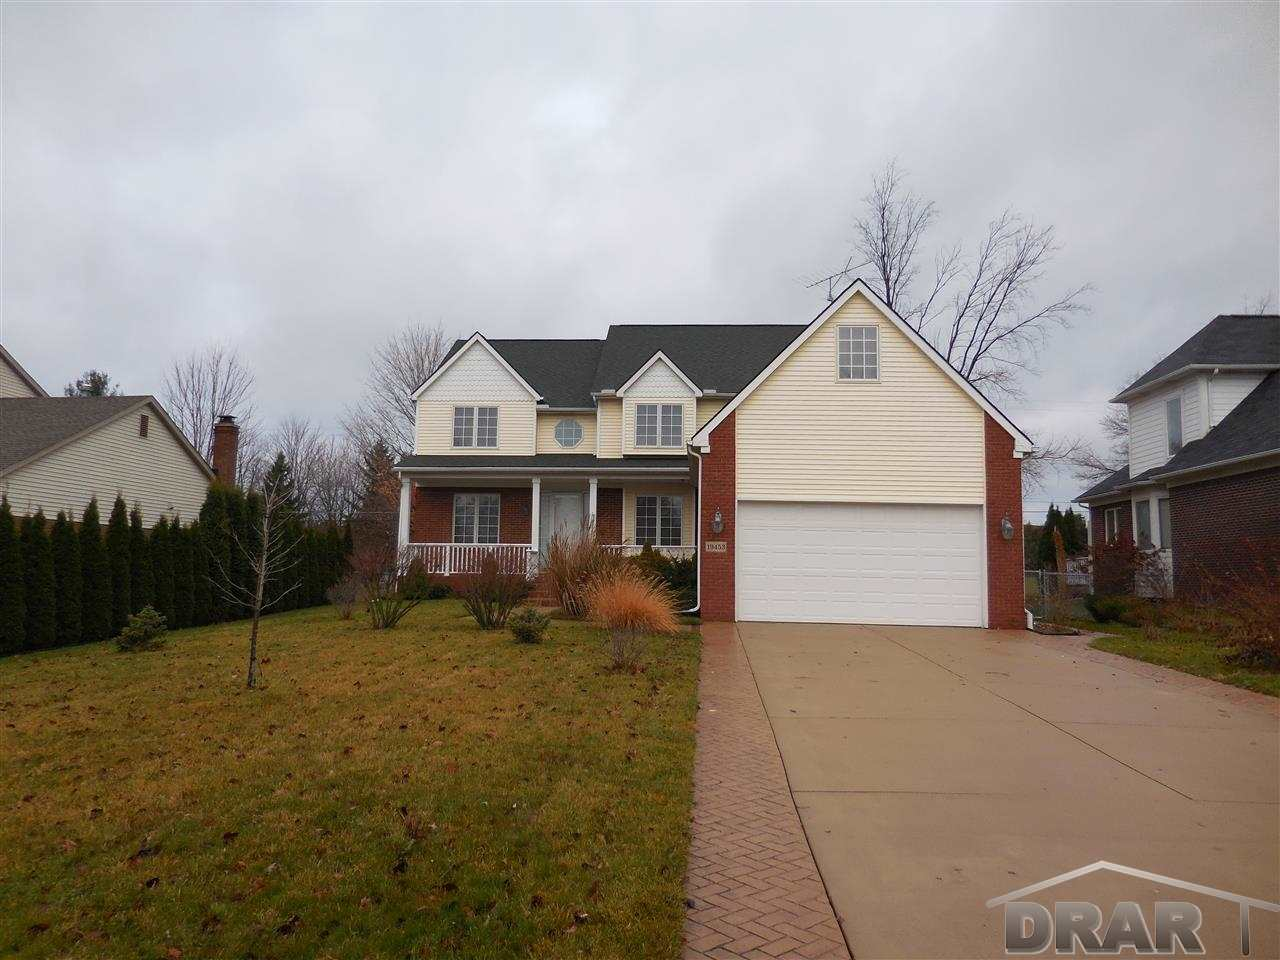 Real Estate for Sale, ListingId: 31823336, Livonia,MI48152